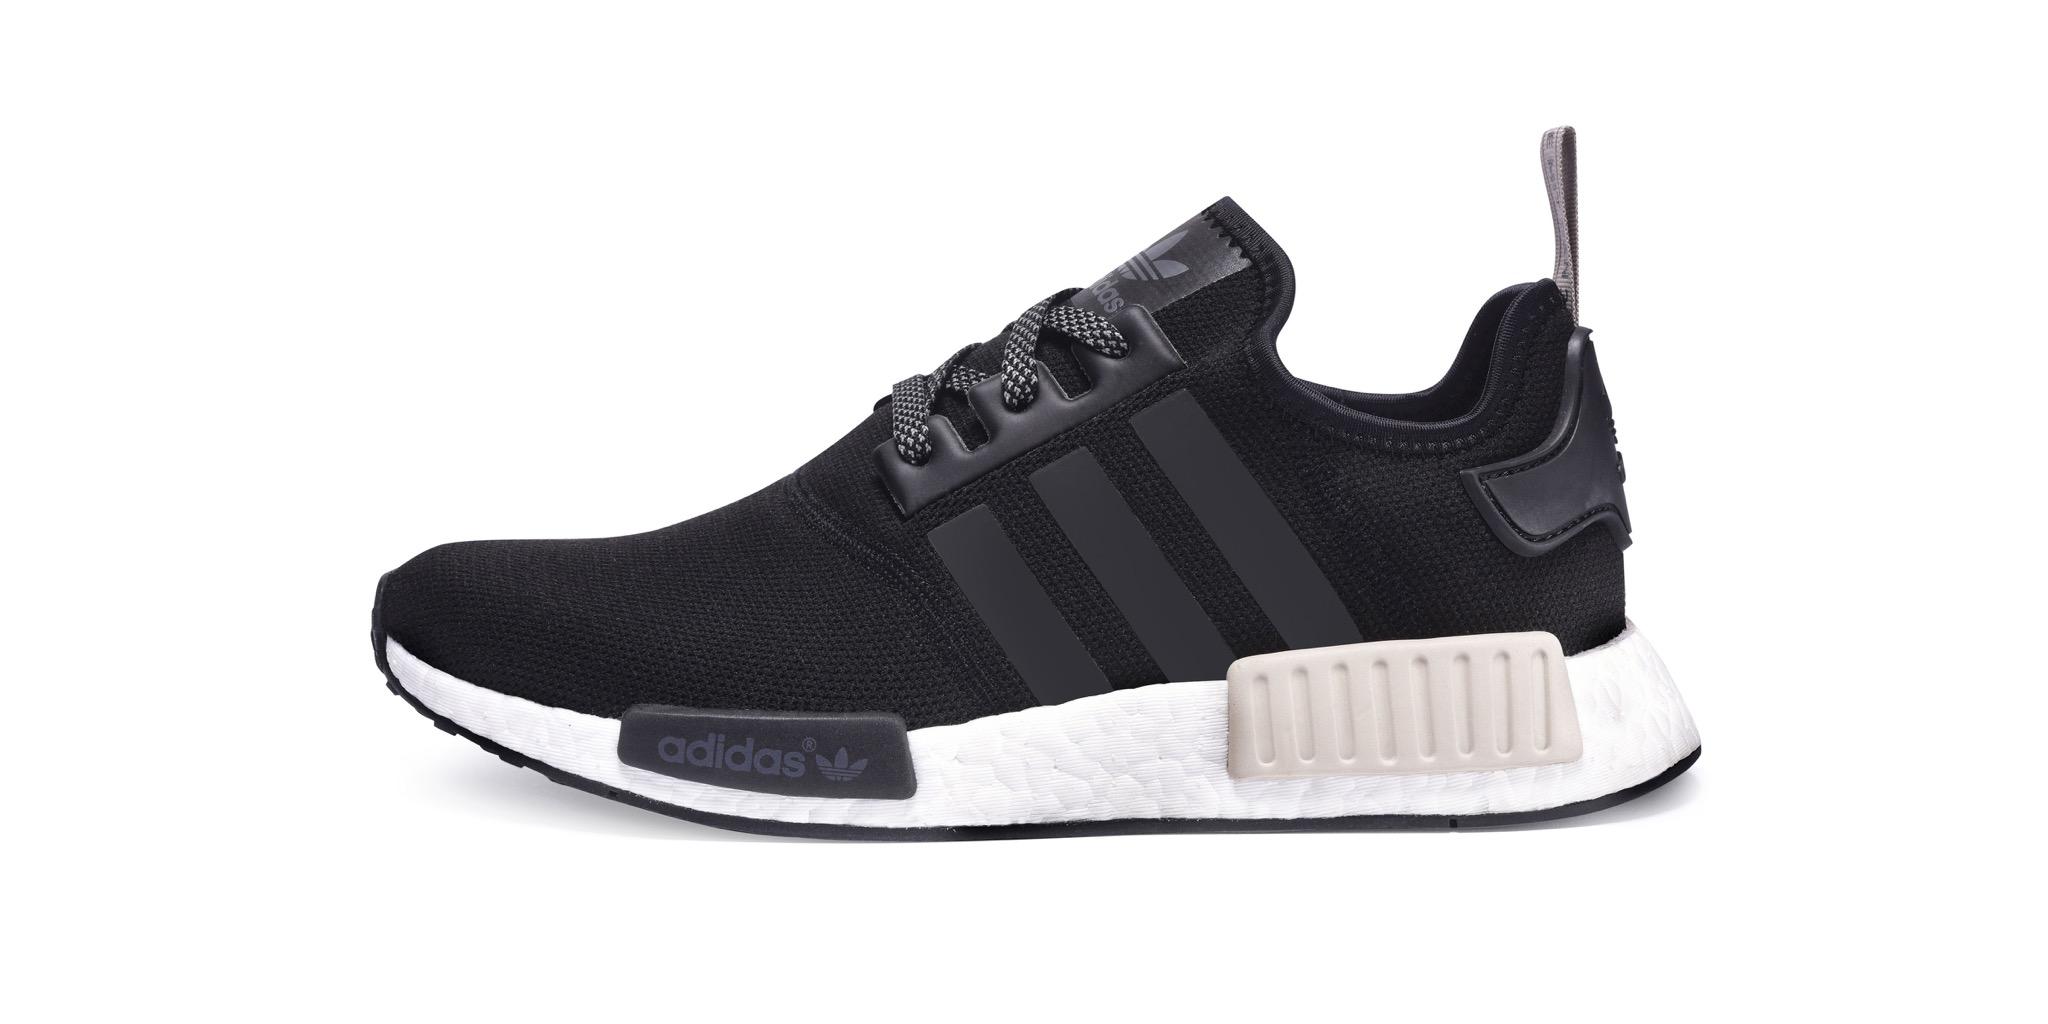 High_1600_800@x3_0017_adidas-NMD-Black-Black-Light-Brown_44913